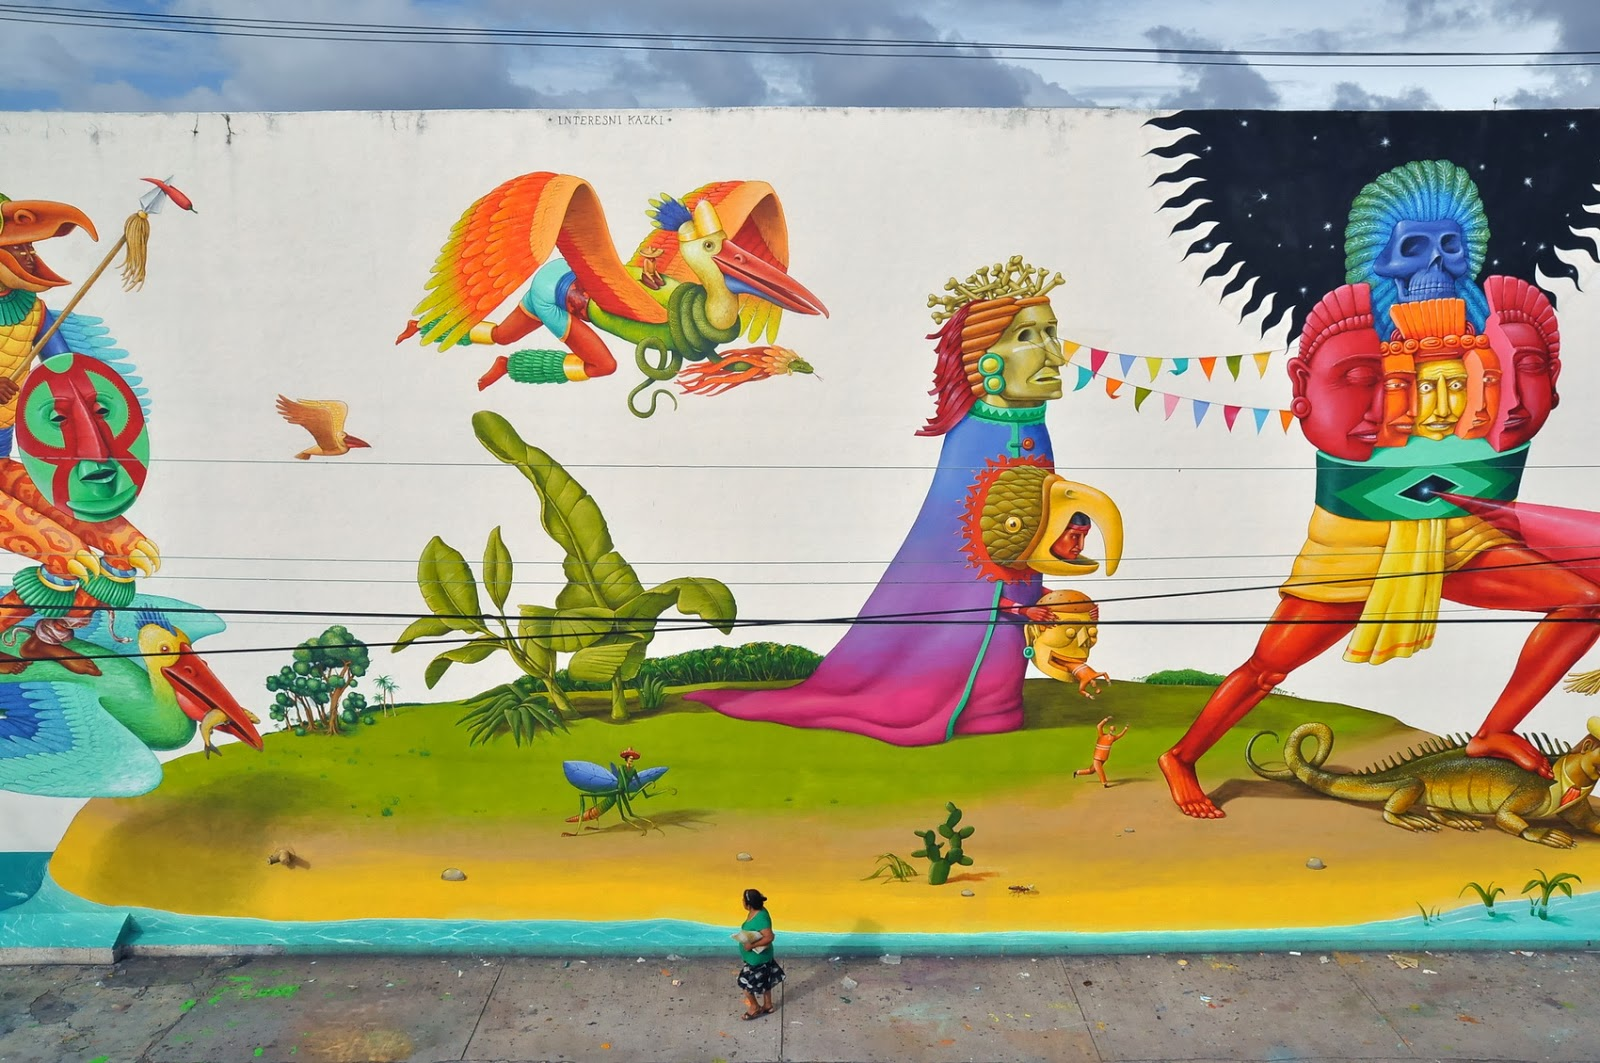 interesni-kazki-new-mural-campeche-mexico-04